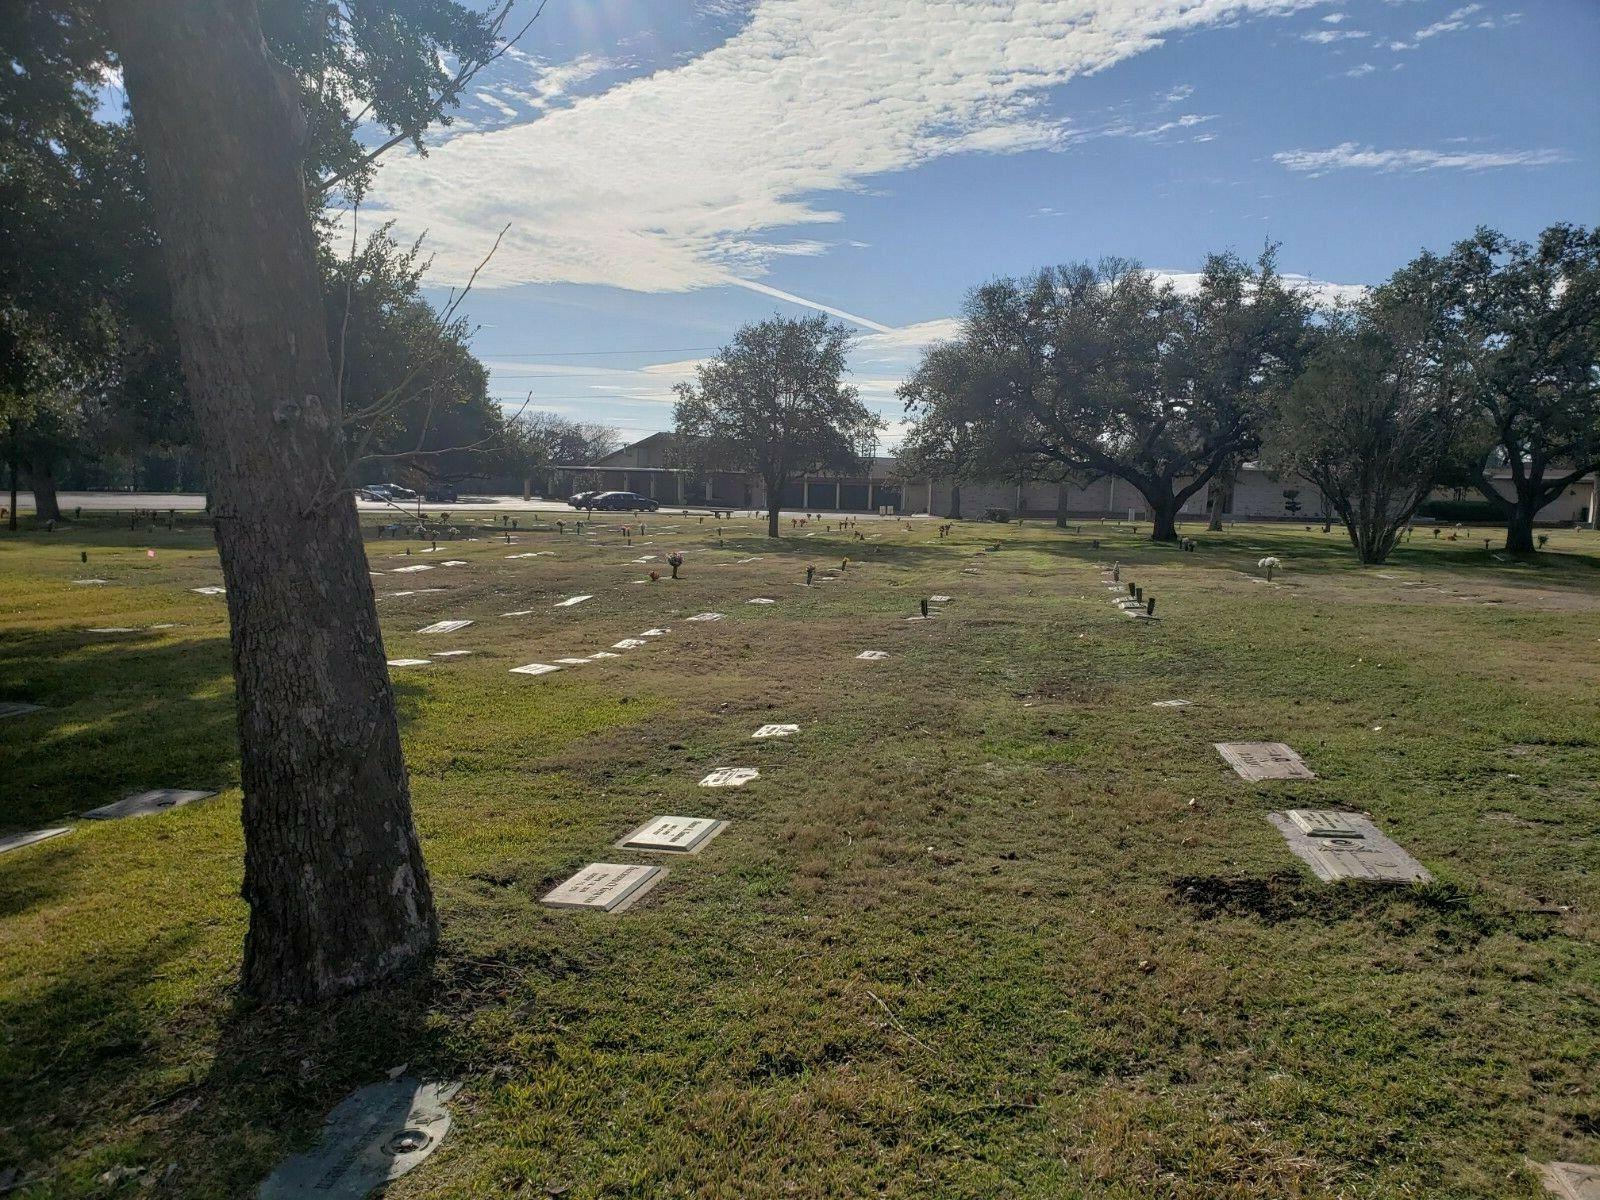 Single/double Burial Plot At Sunset Memorial In SA Tx.Sec. 4 Chapel View,lot 262 - $5,500.00